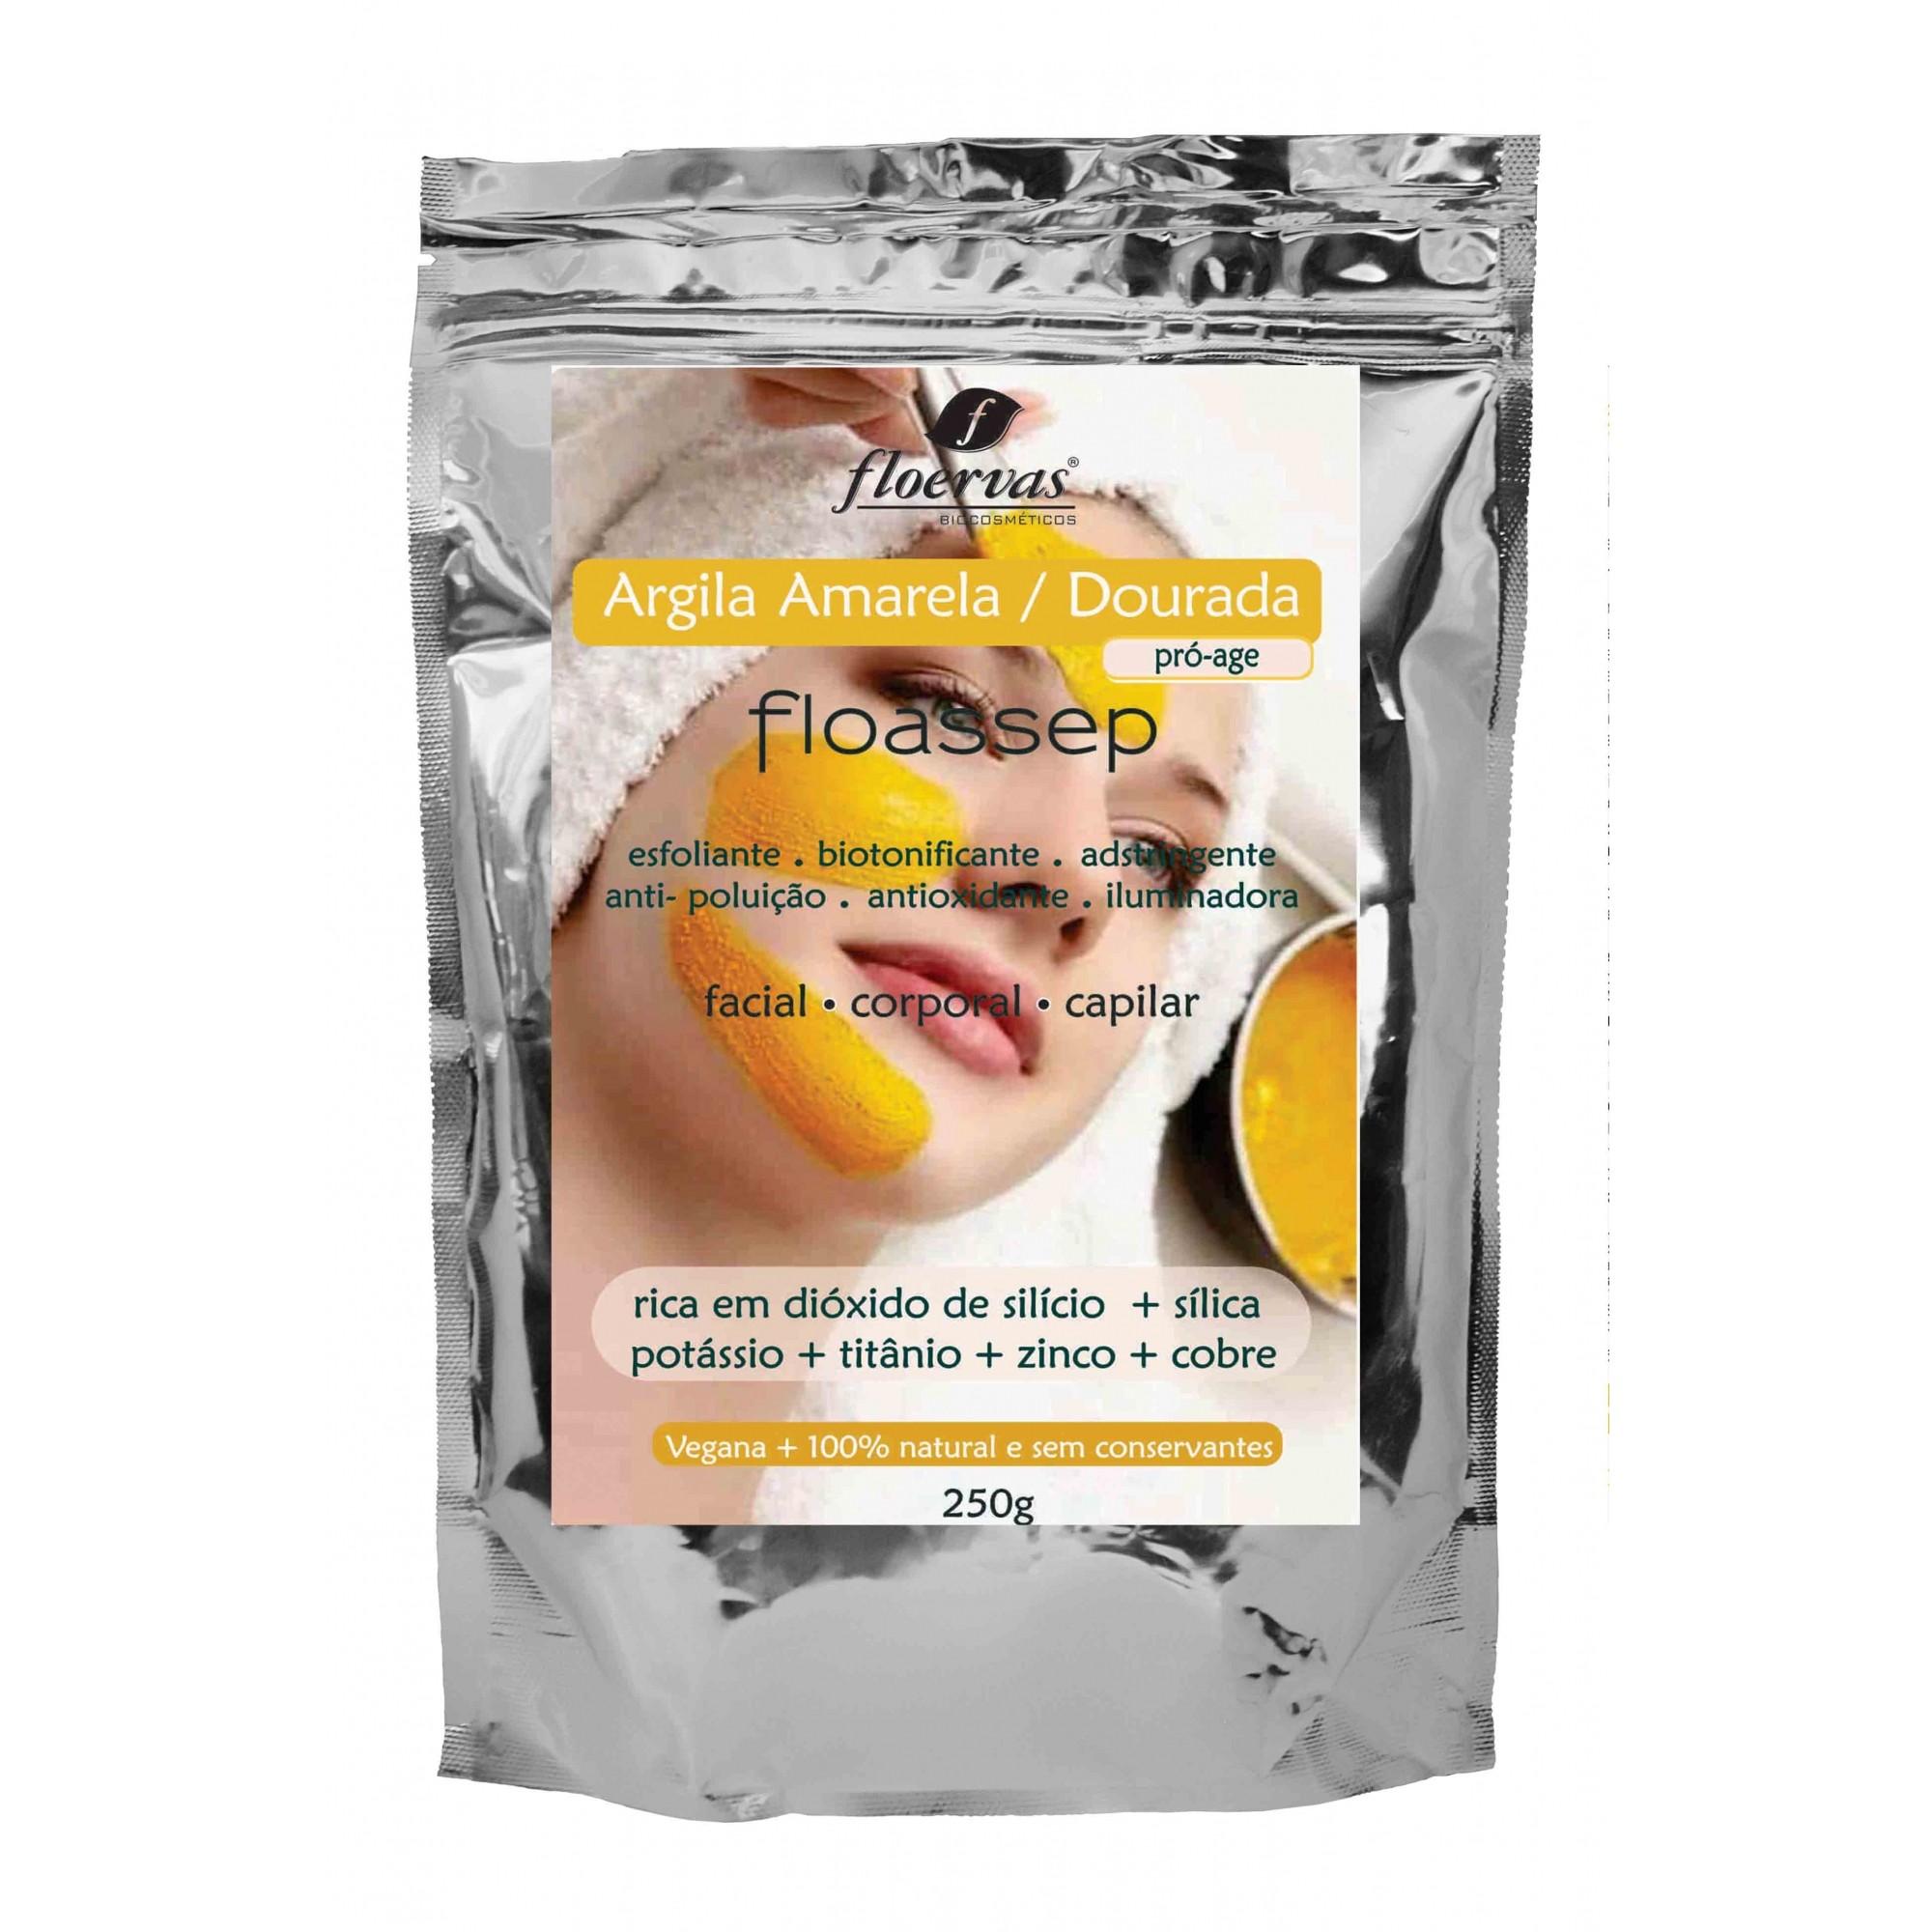 Cód. 632 - Argila Amarela / Dourada Vegana 100% natural  (Pro-age)- 250g